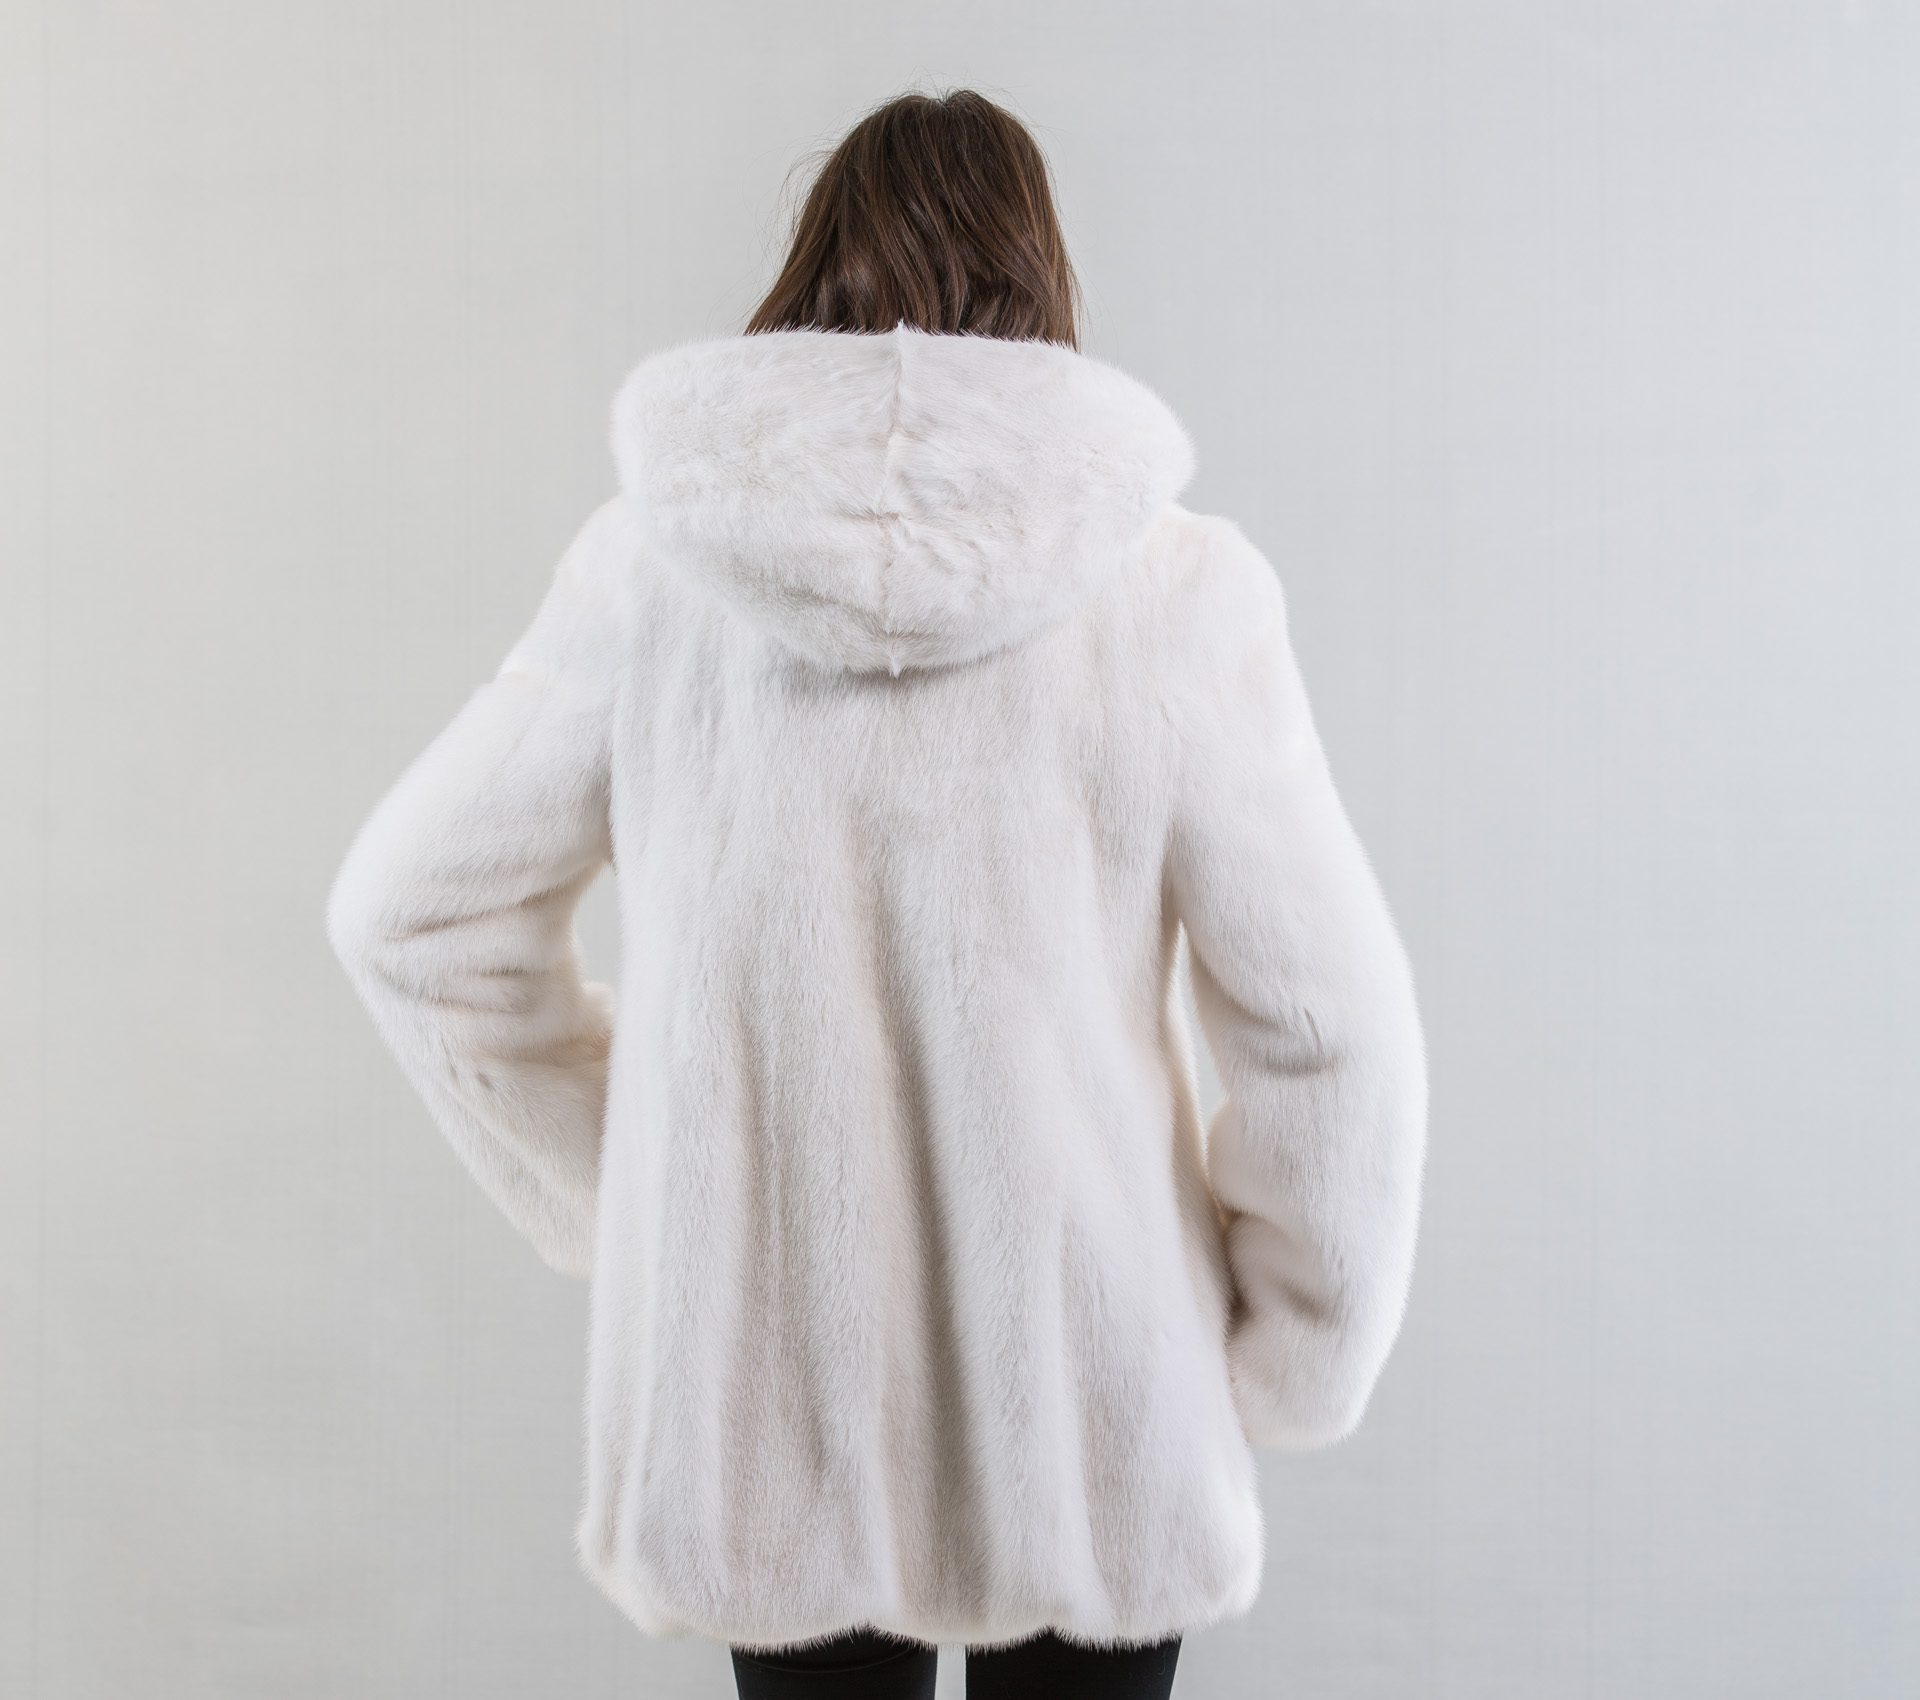 6f059286cf White Mink Fur Coat With Hood - Haute Acorn